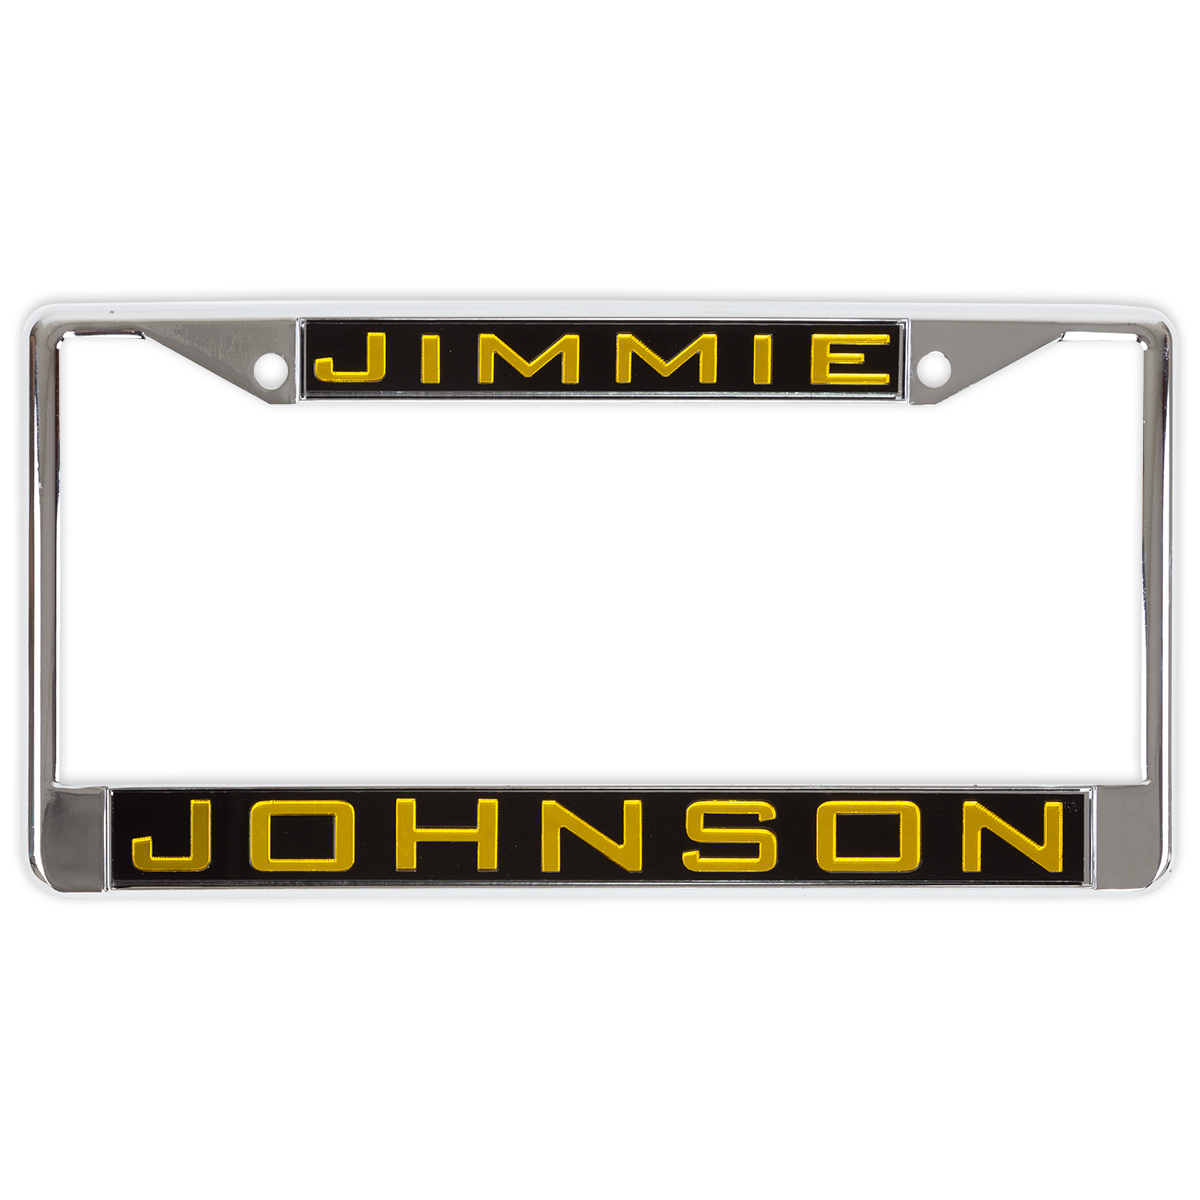 Jimmie Johnson #48 2018 NASCAR Inlaid Metal License Plate Frame